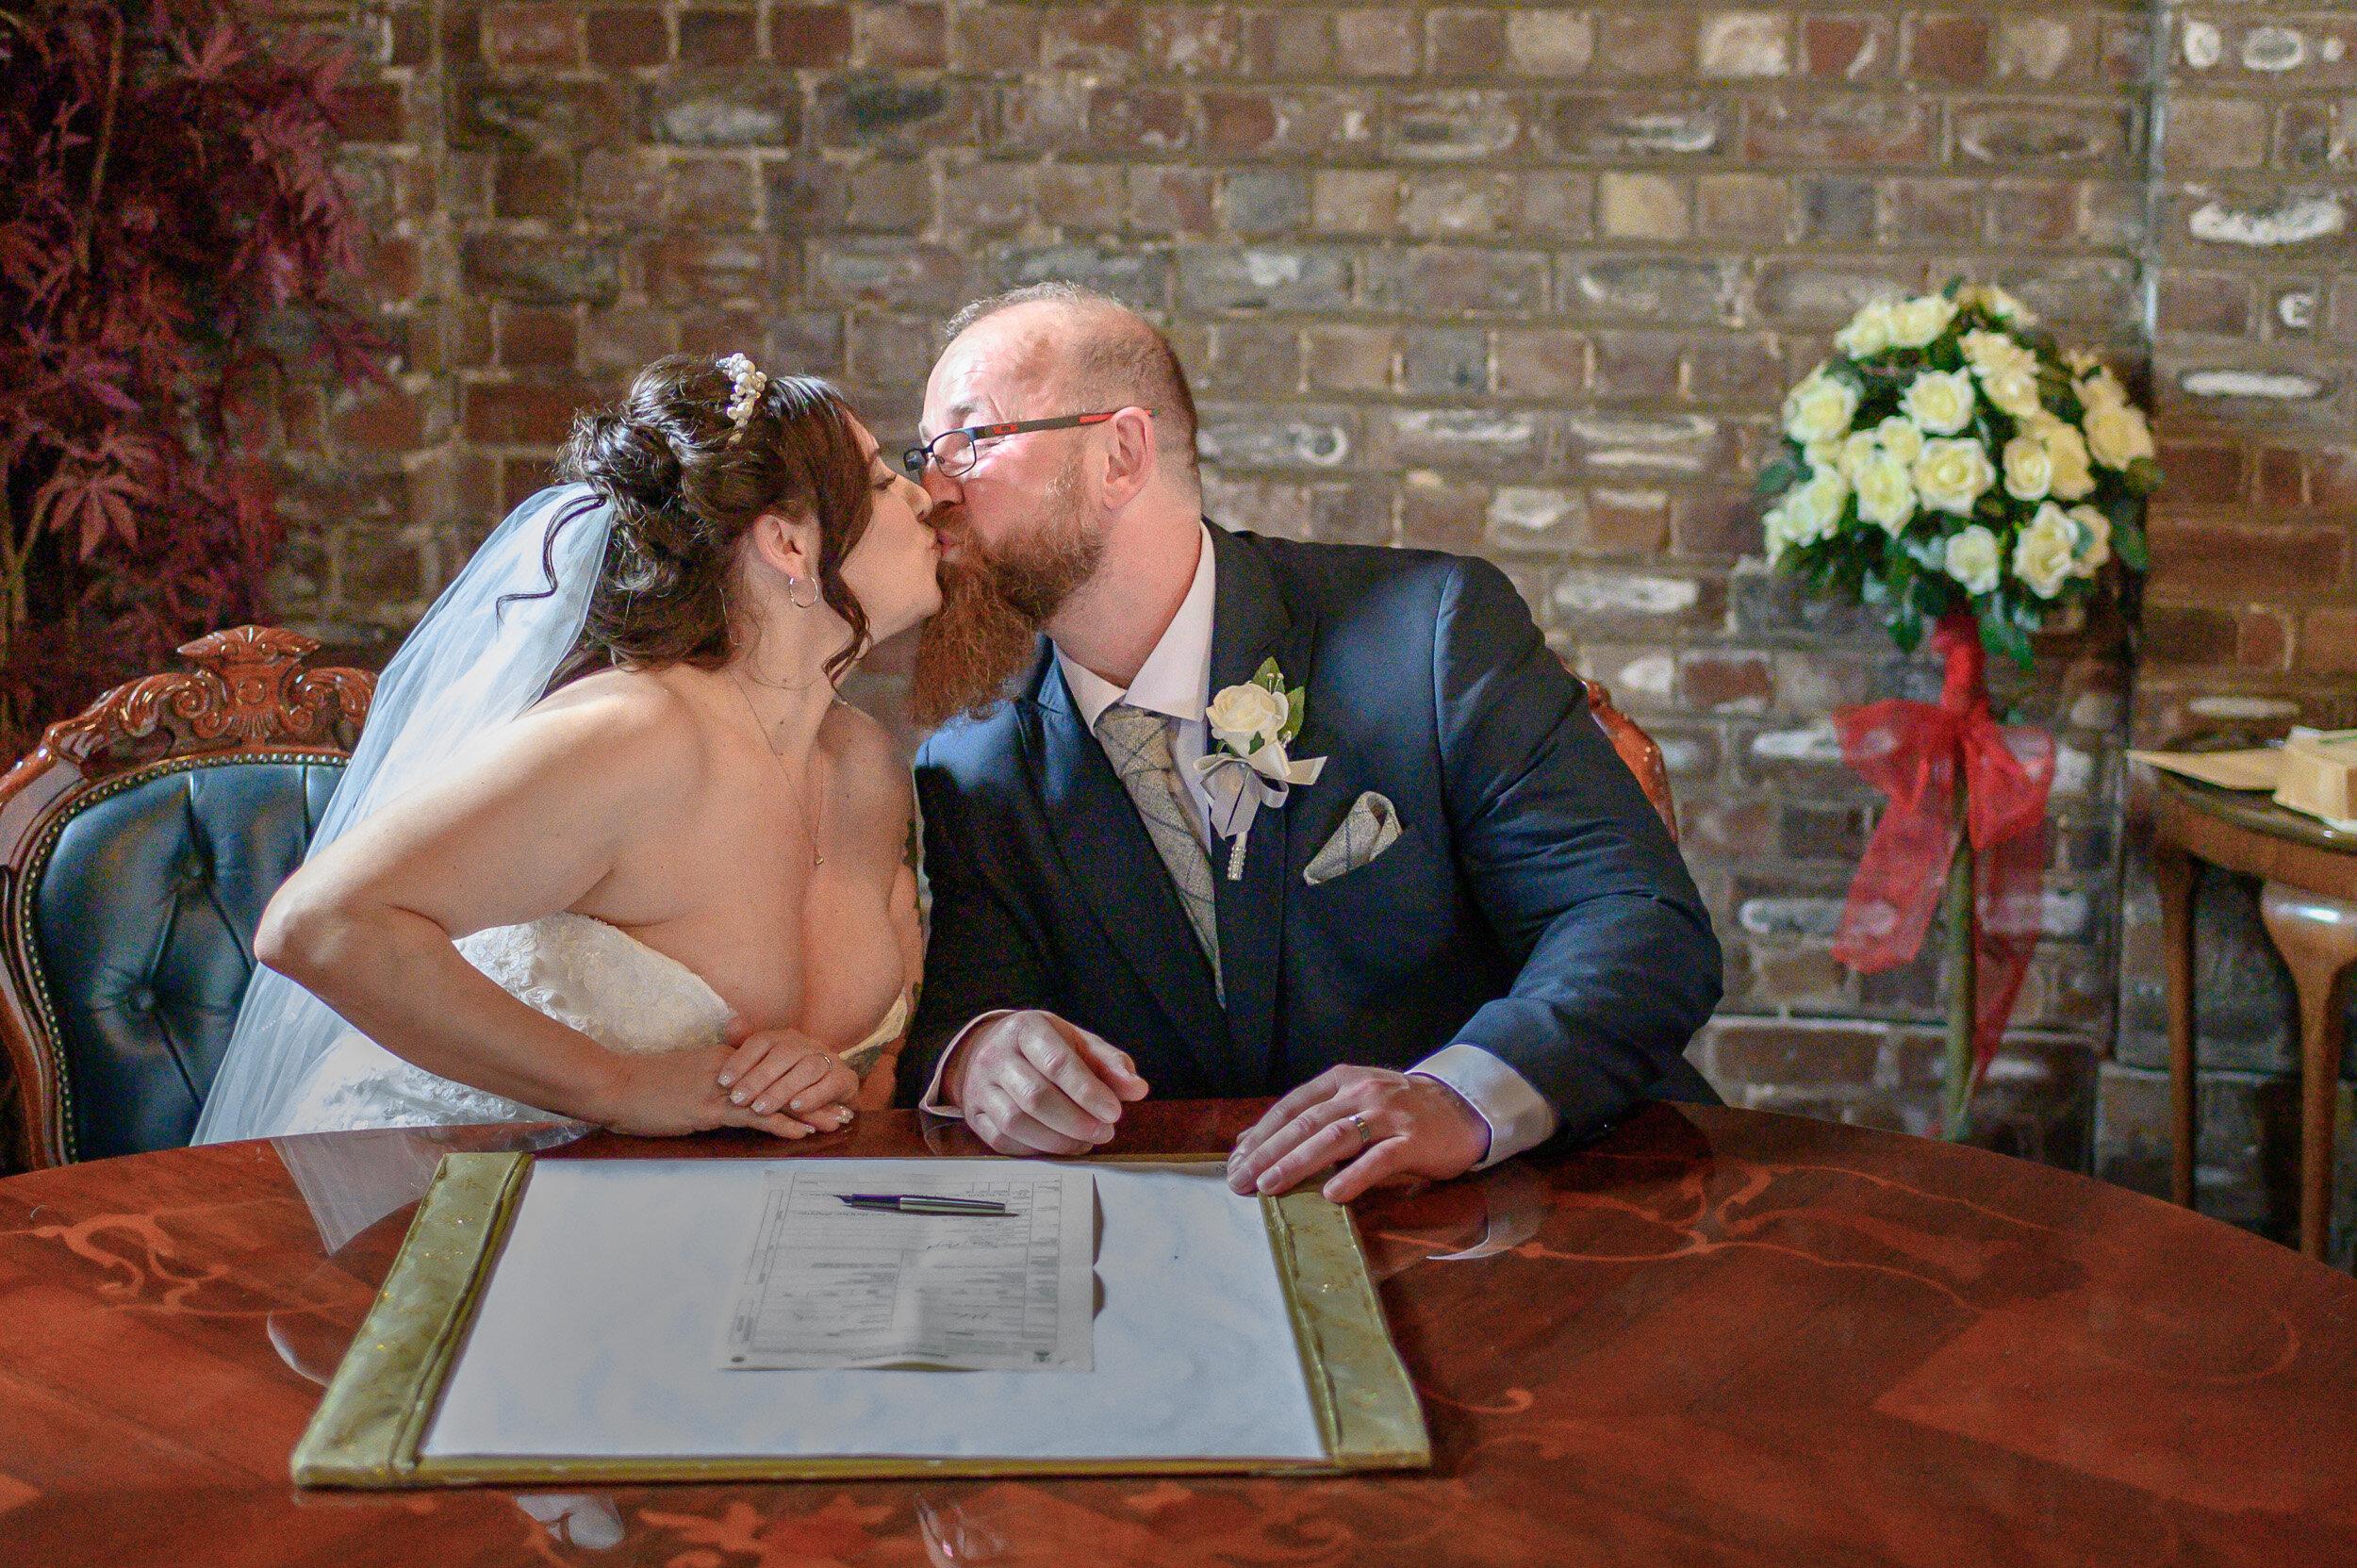 Heaton_wedding_photos_Gretna-16.jpg